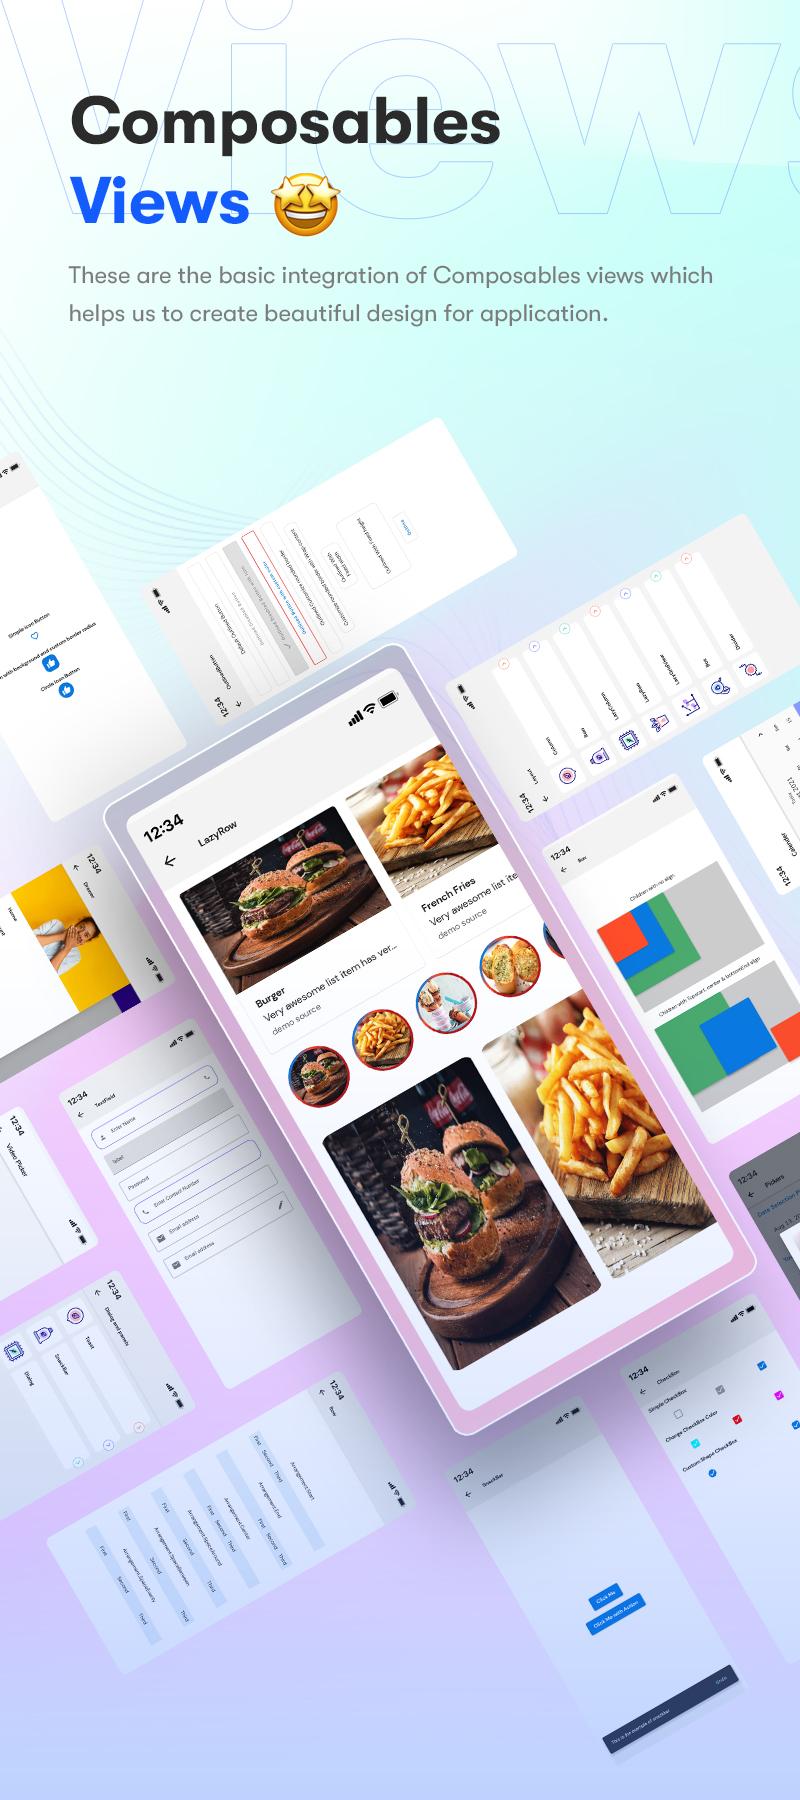 Android Jetpack Compose UI Kit | Prokit | Iqonic Design android jetpack compose ui kit Prokit 00 Views